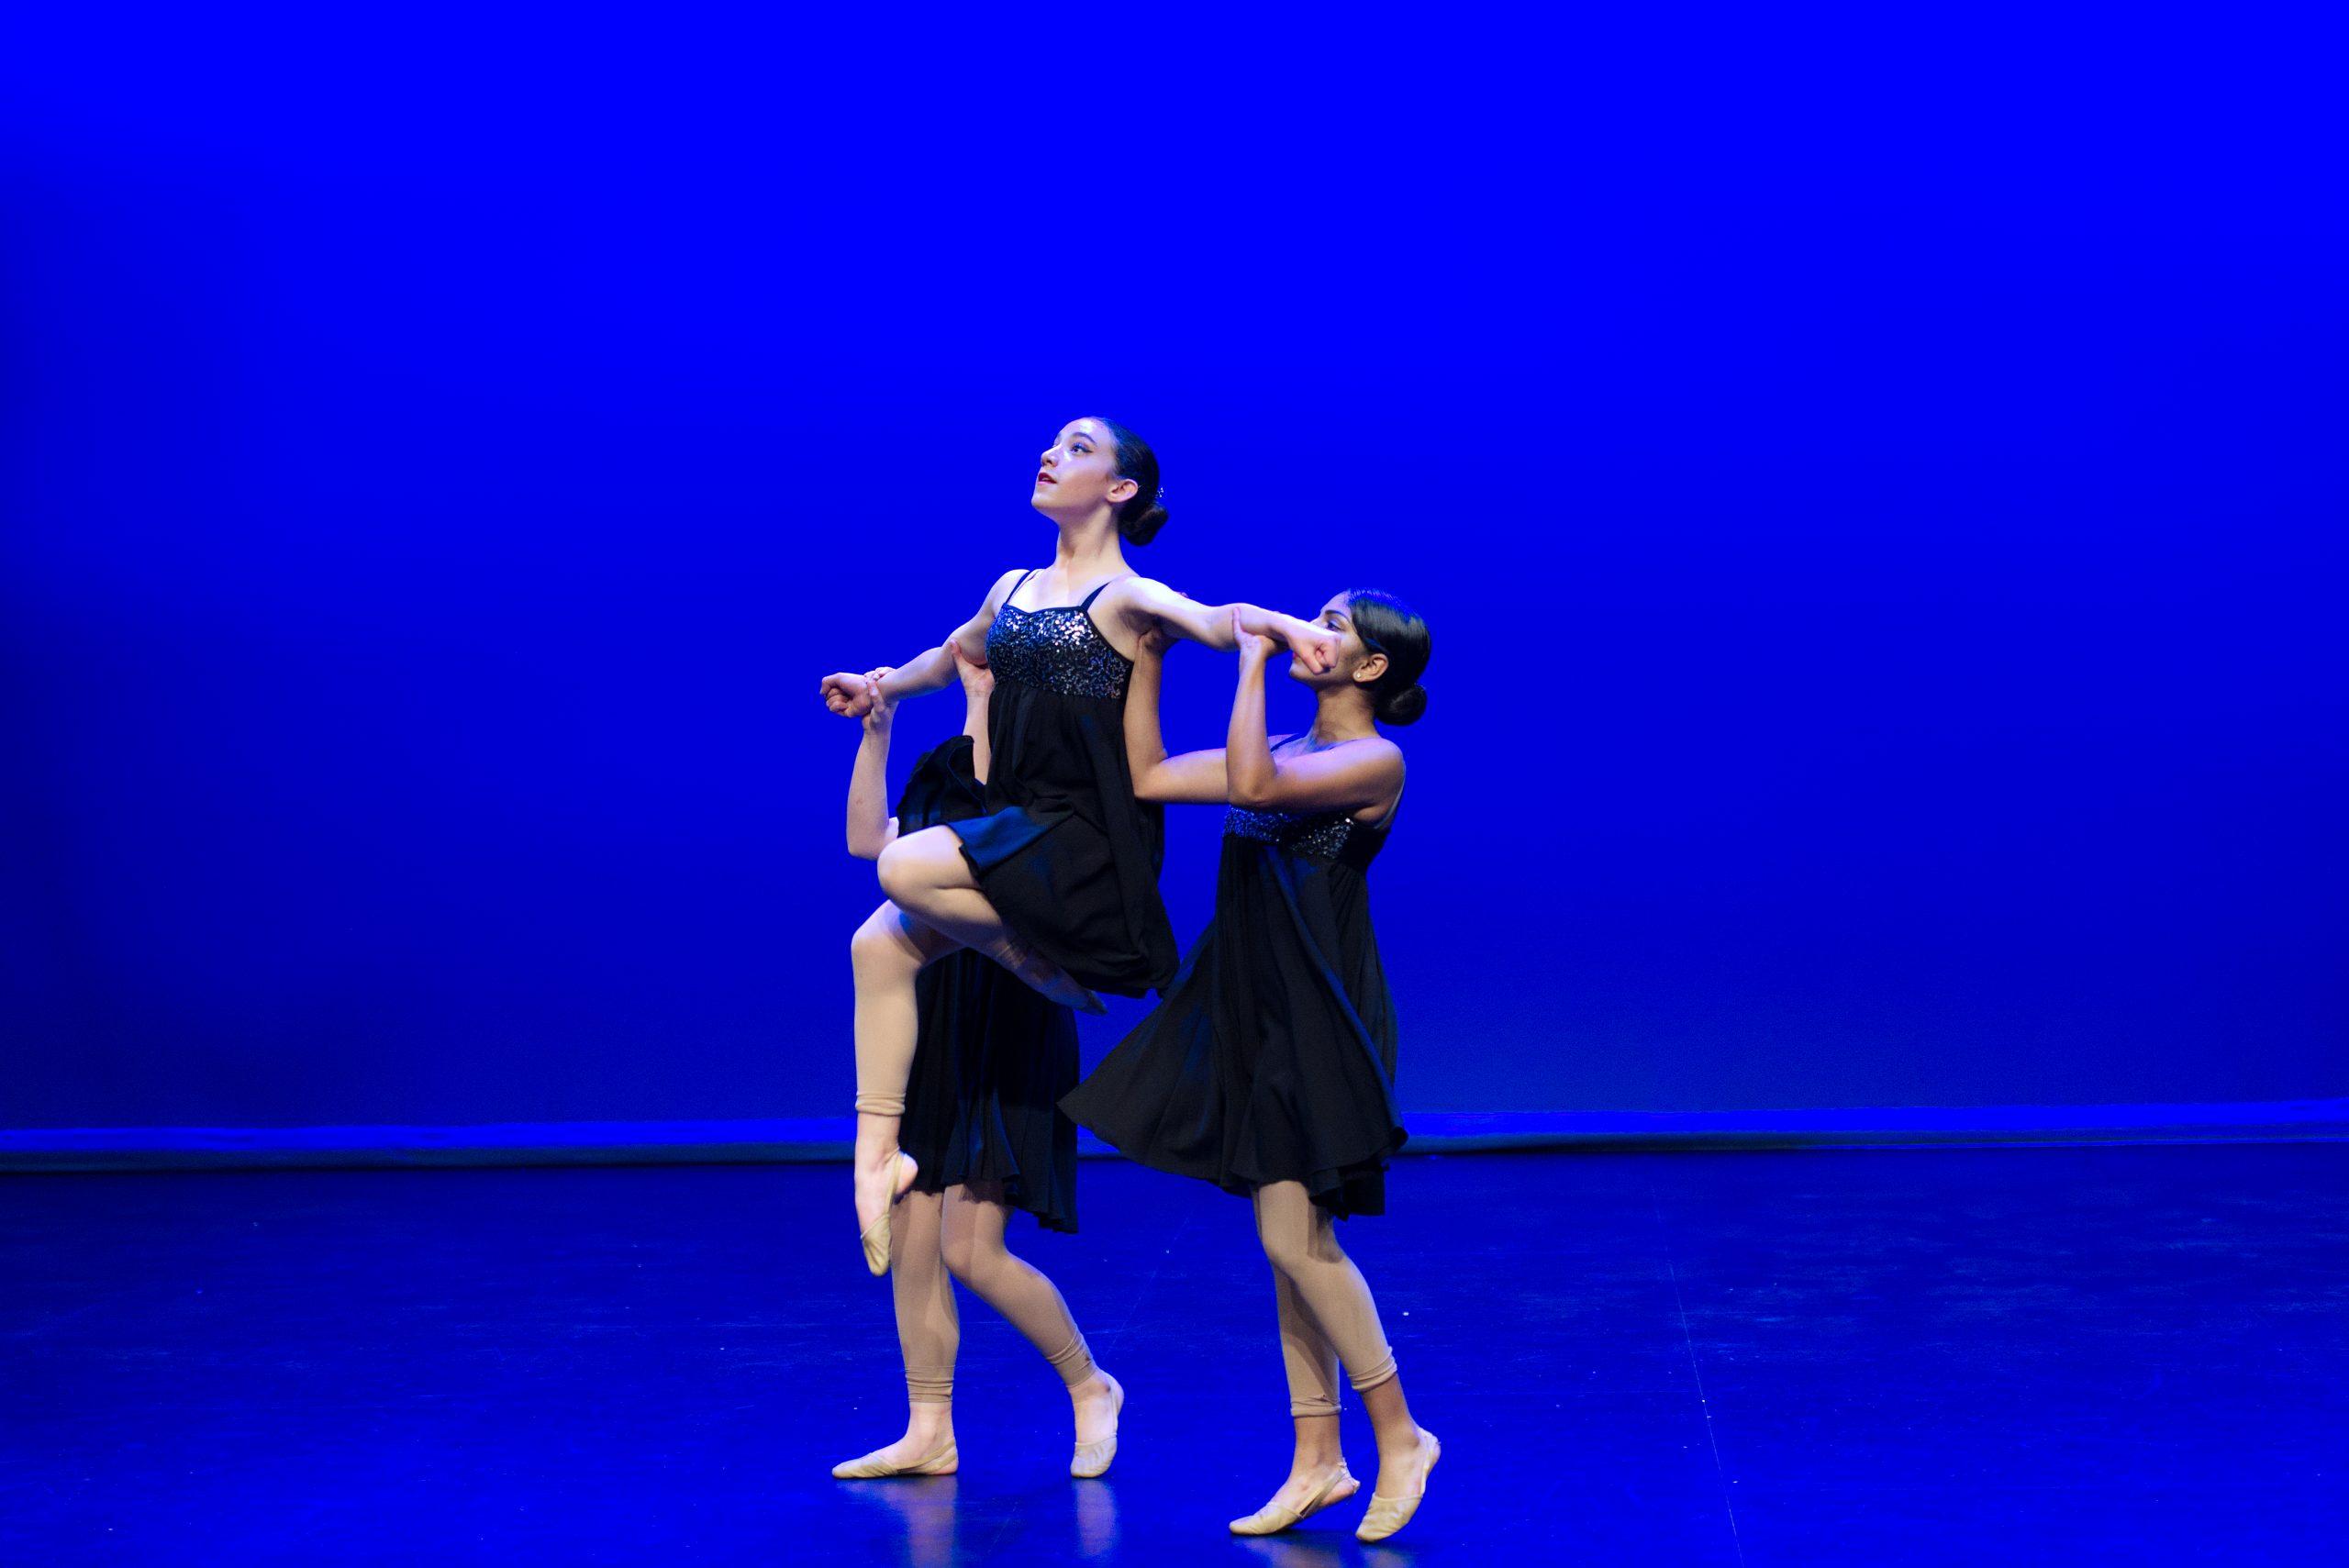 Diakosmos_Dance_Academy_contemporary_senior_group